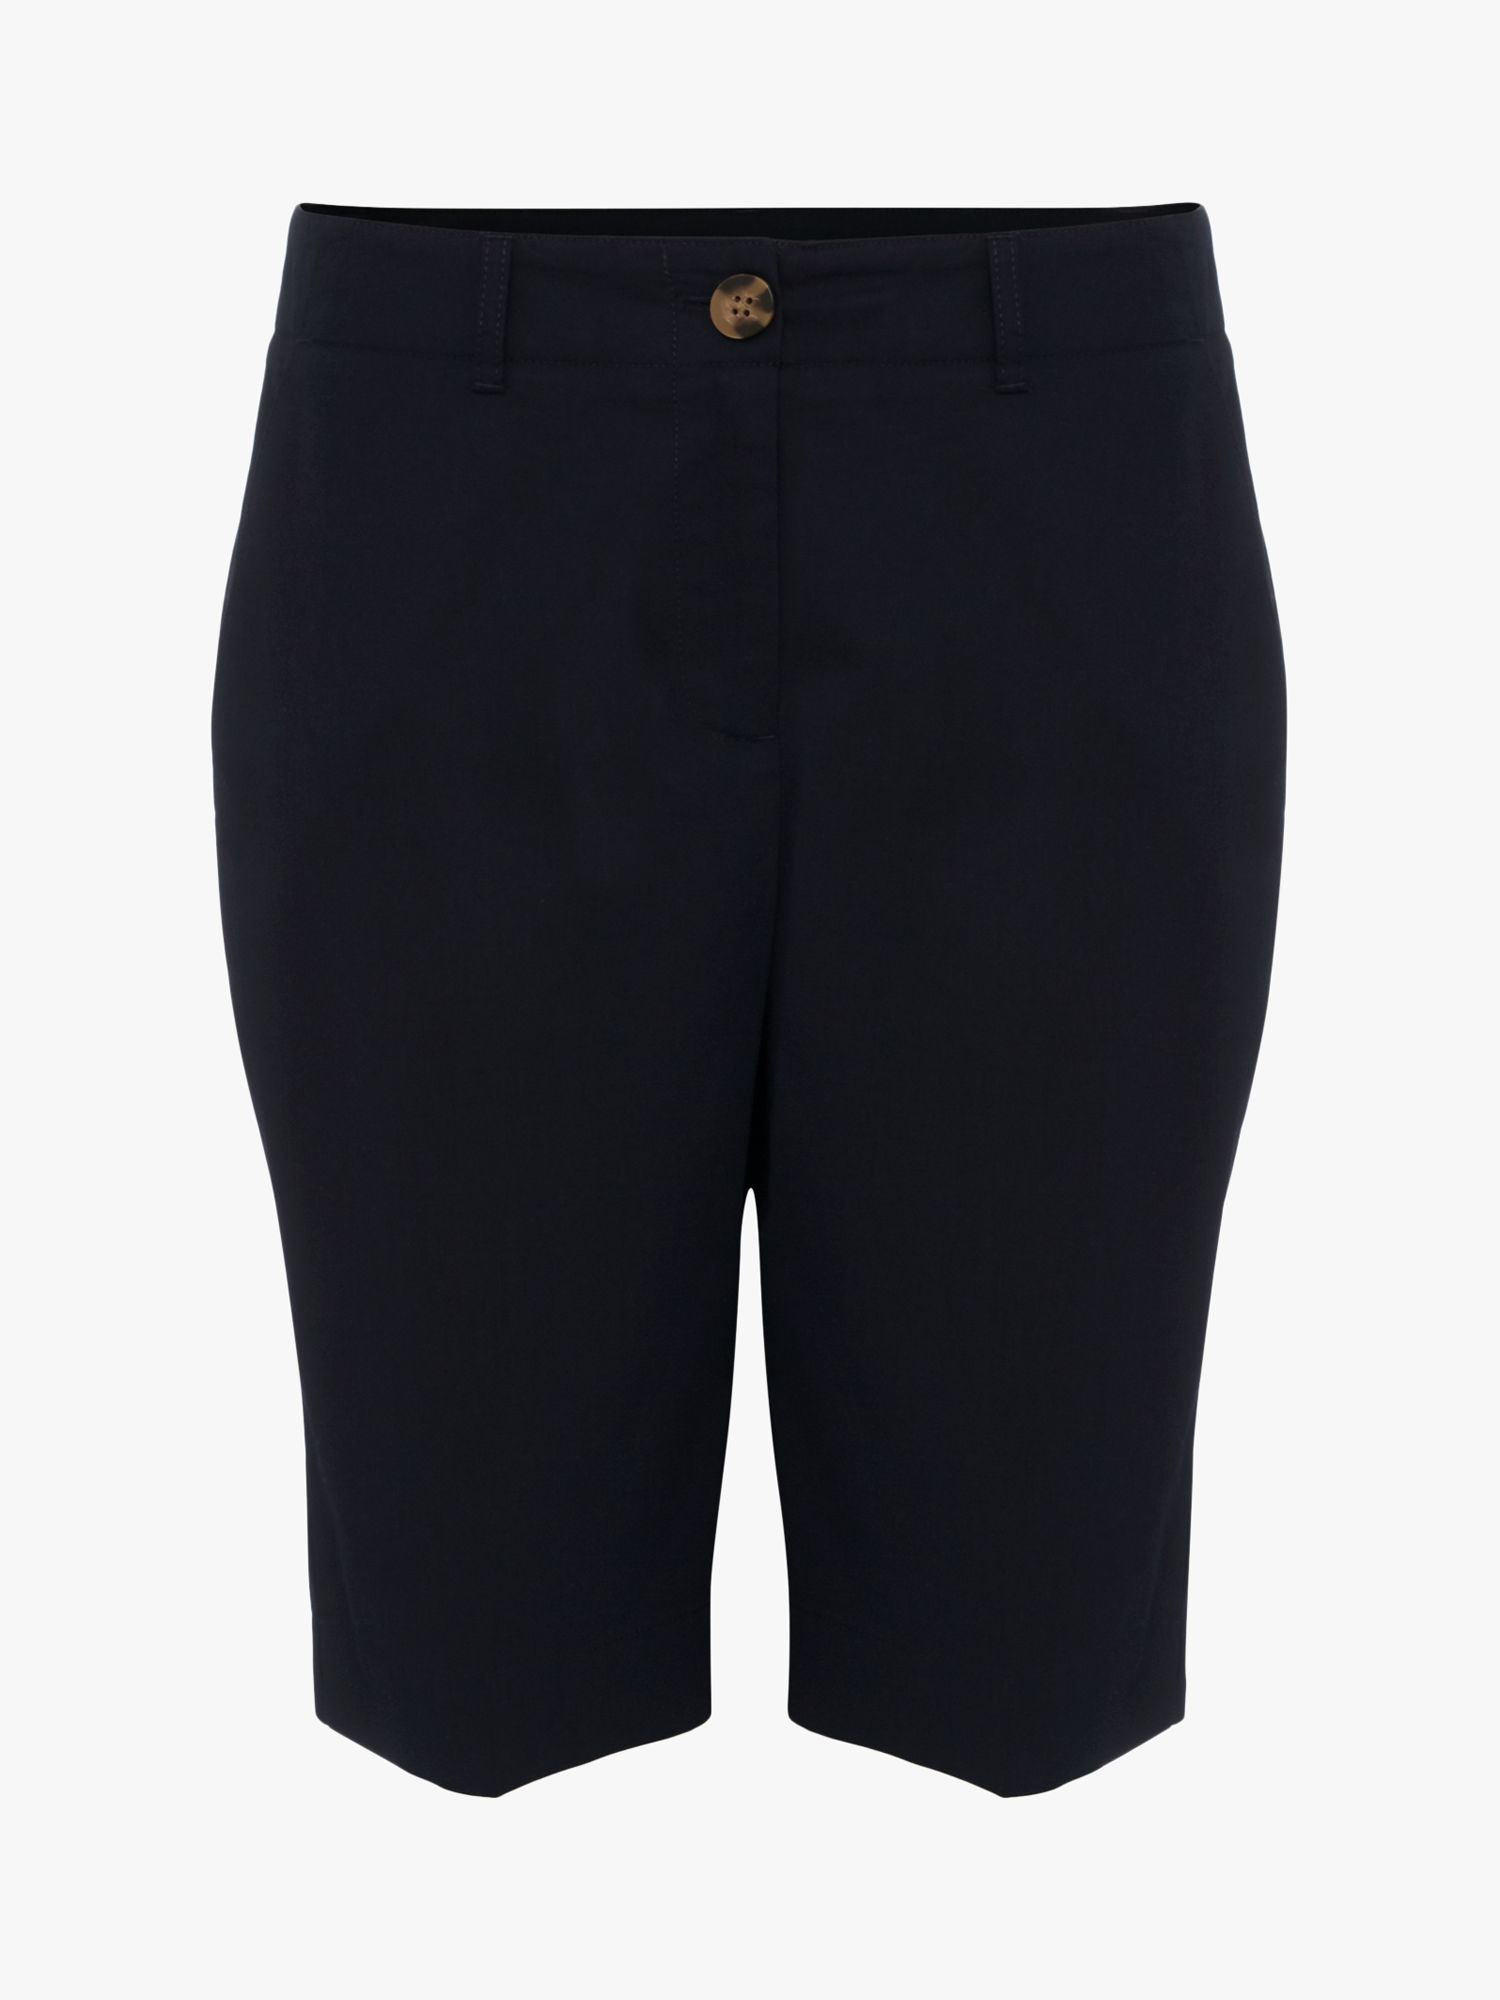 Hobbs Tulip Longline Shorts, Navy